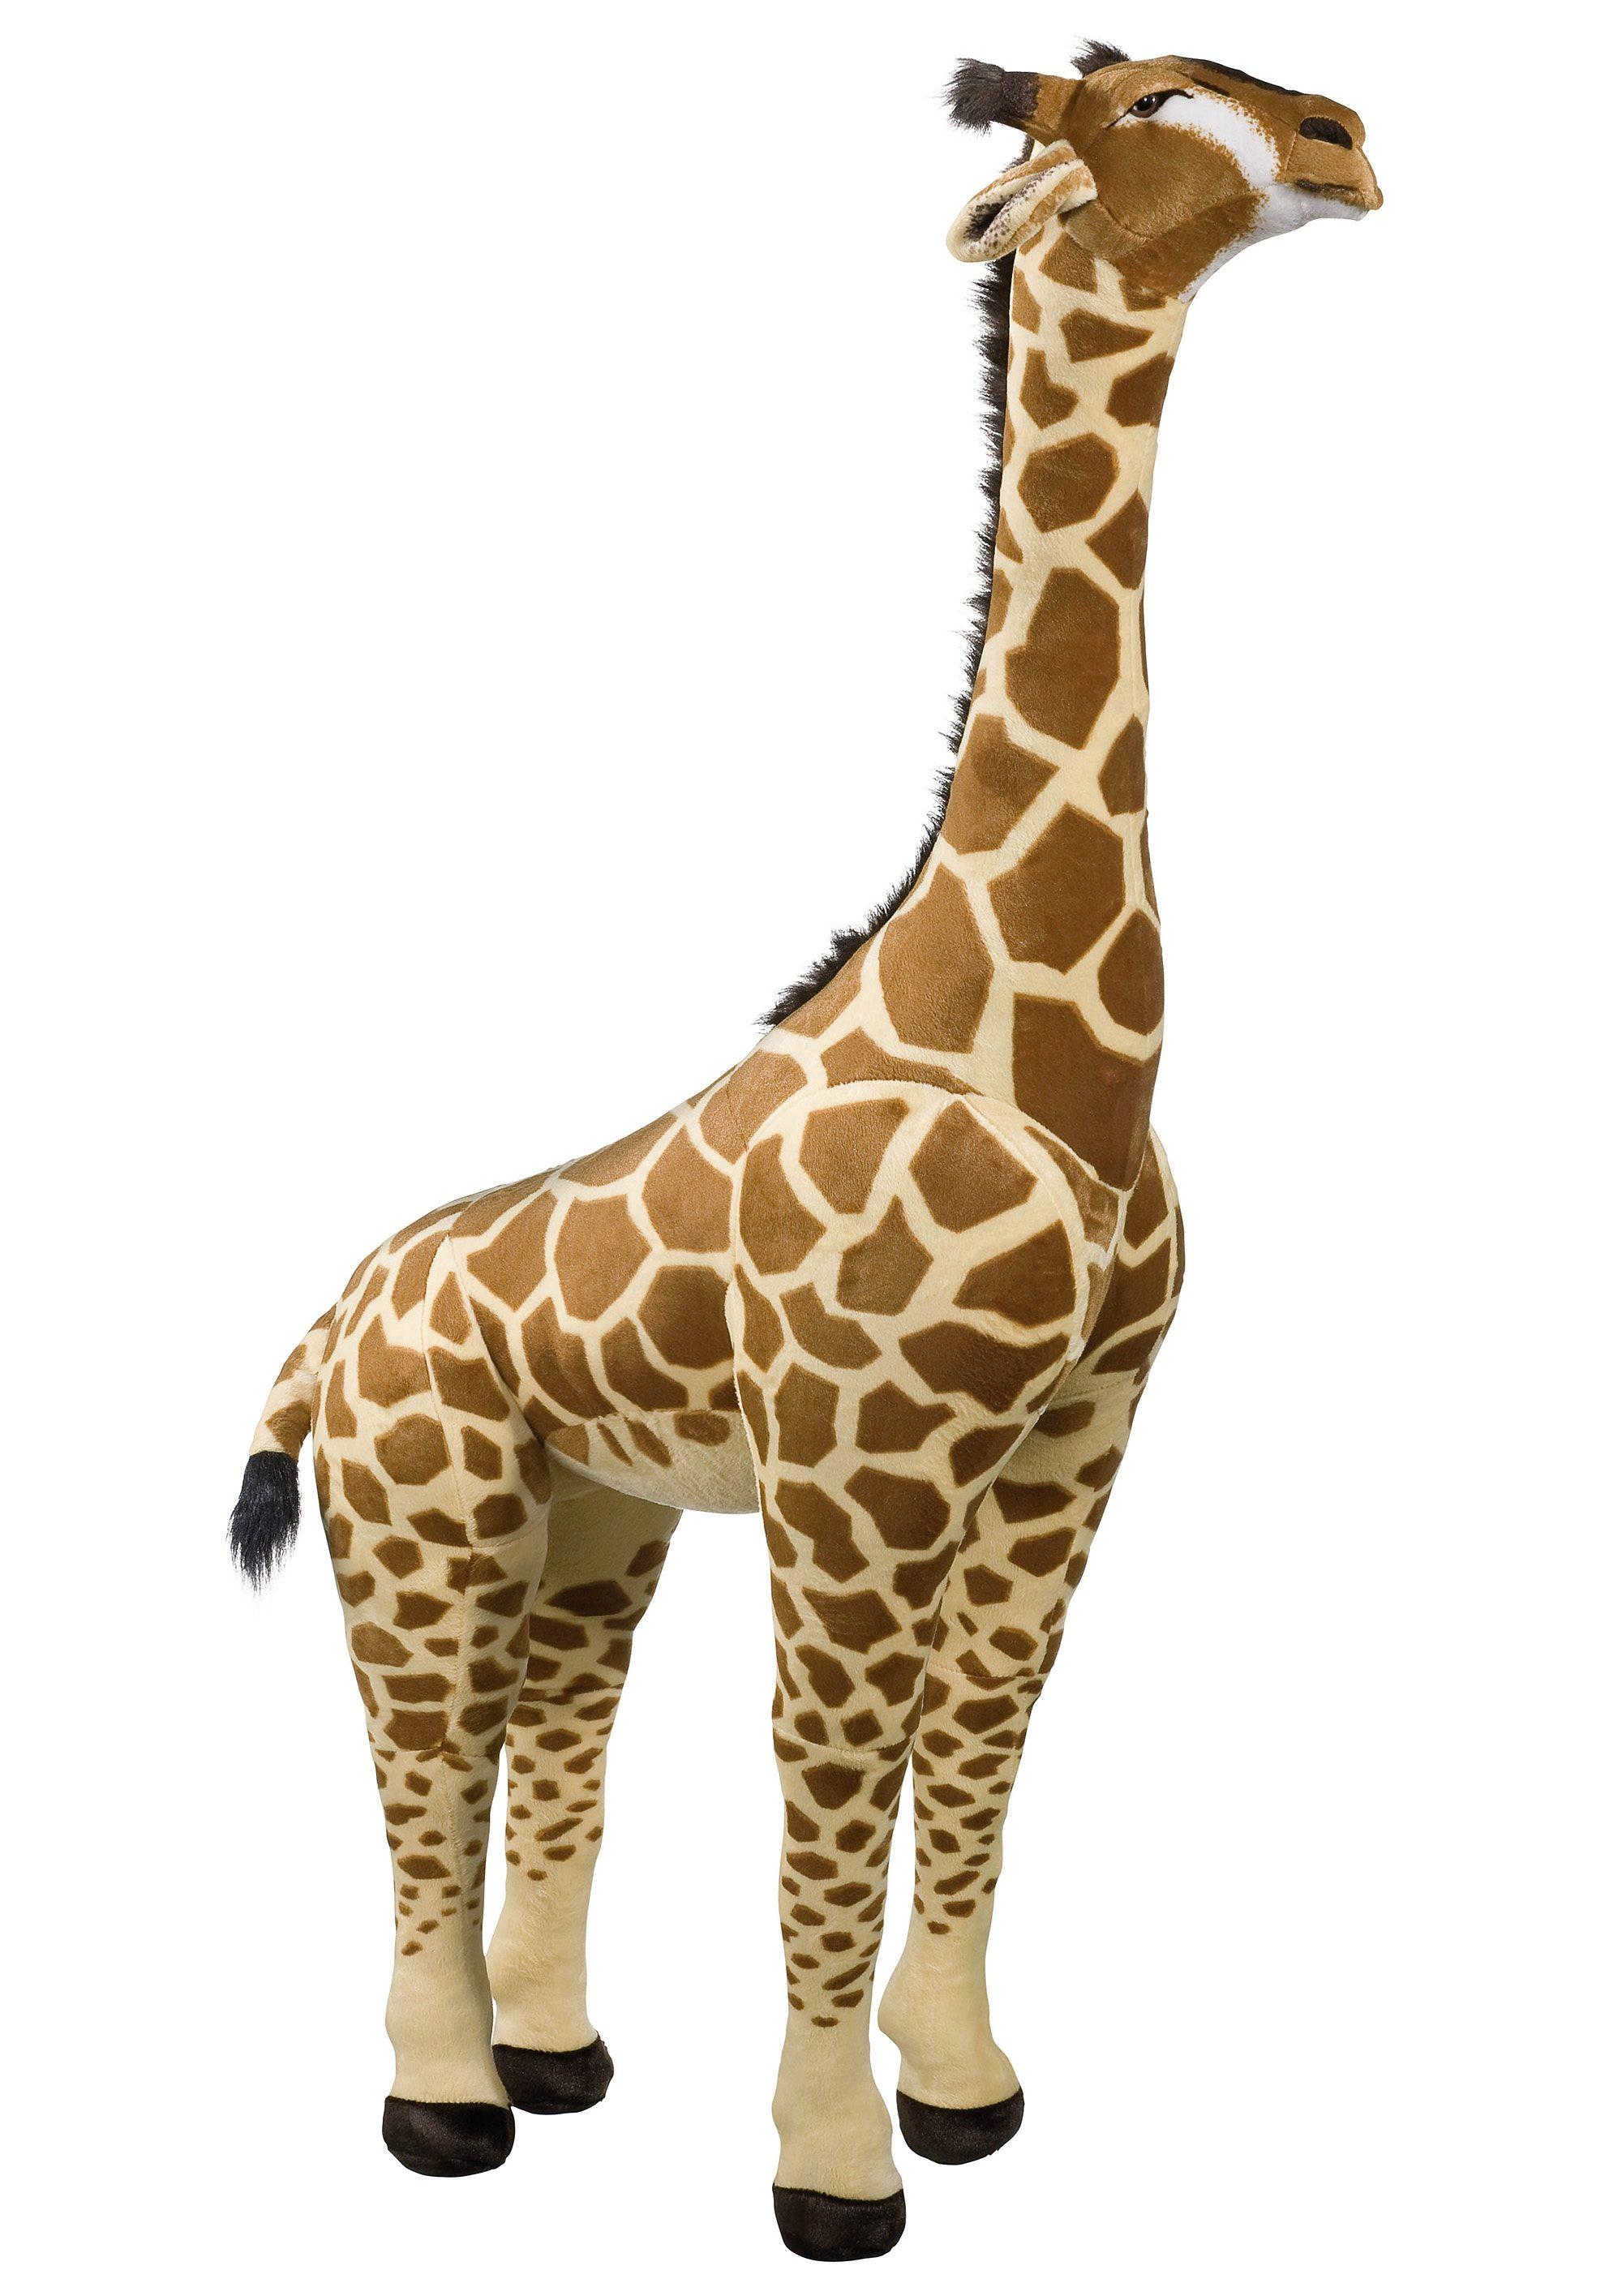 Heunec Plüschtier »Giraffe stehend Höhe ca. 145 cm«